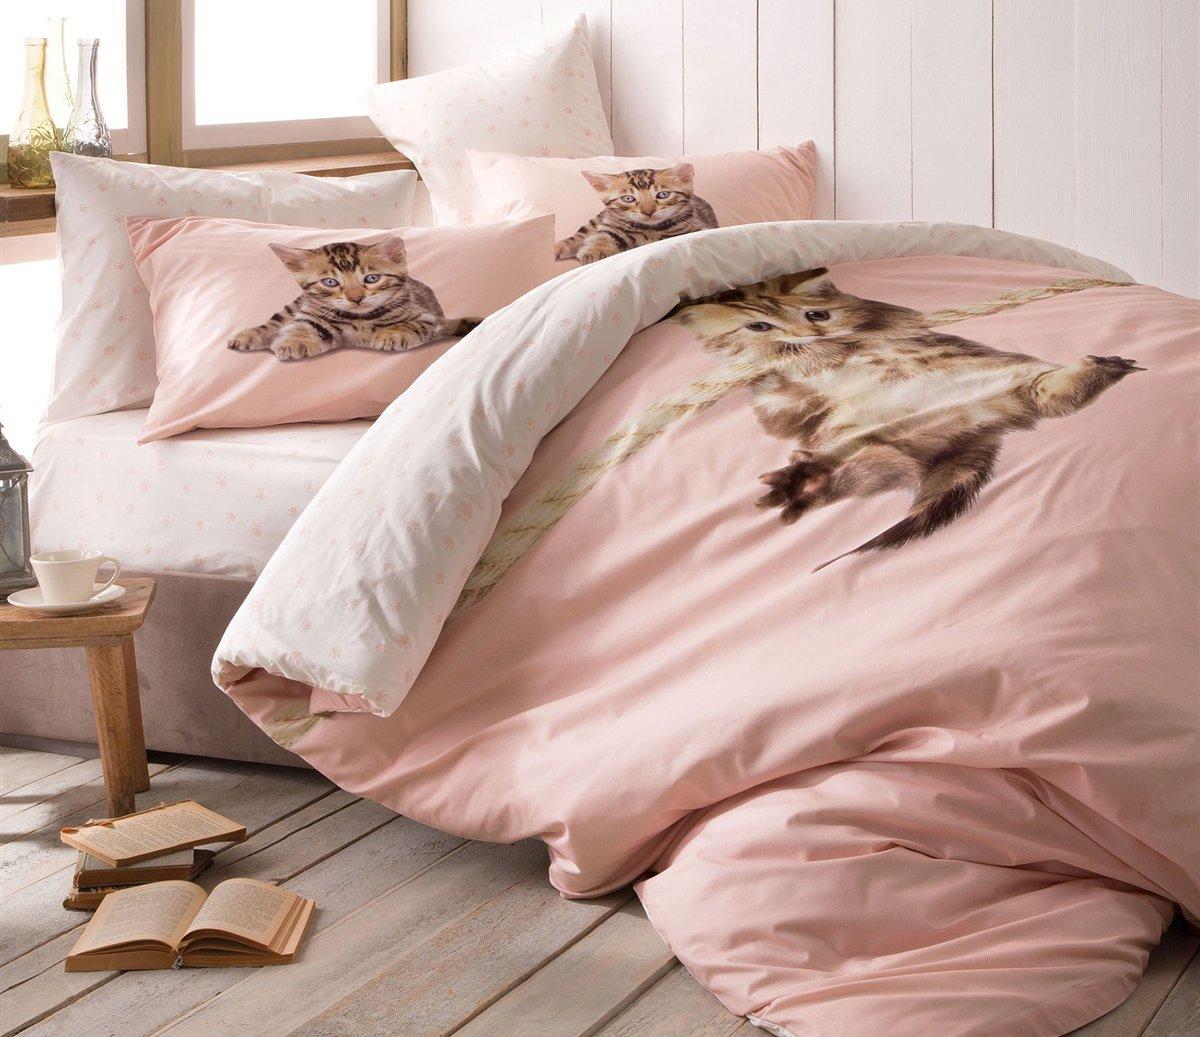 Paris Home 100% Cotton 5pcs Full Size Comforter Set Kitty Little Cute Cats Bedding Linens